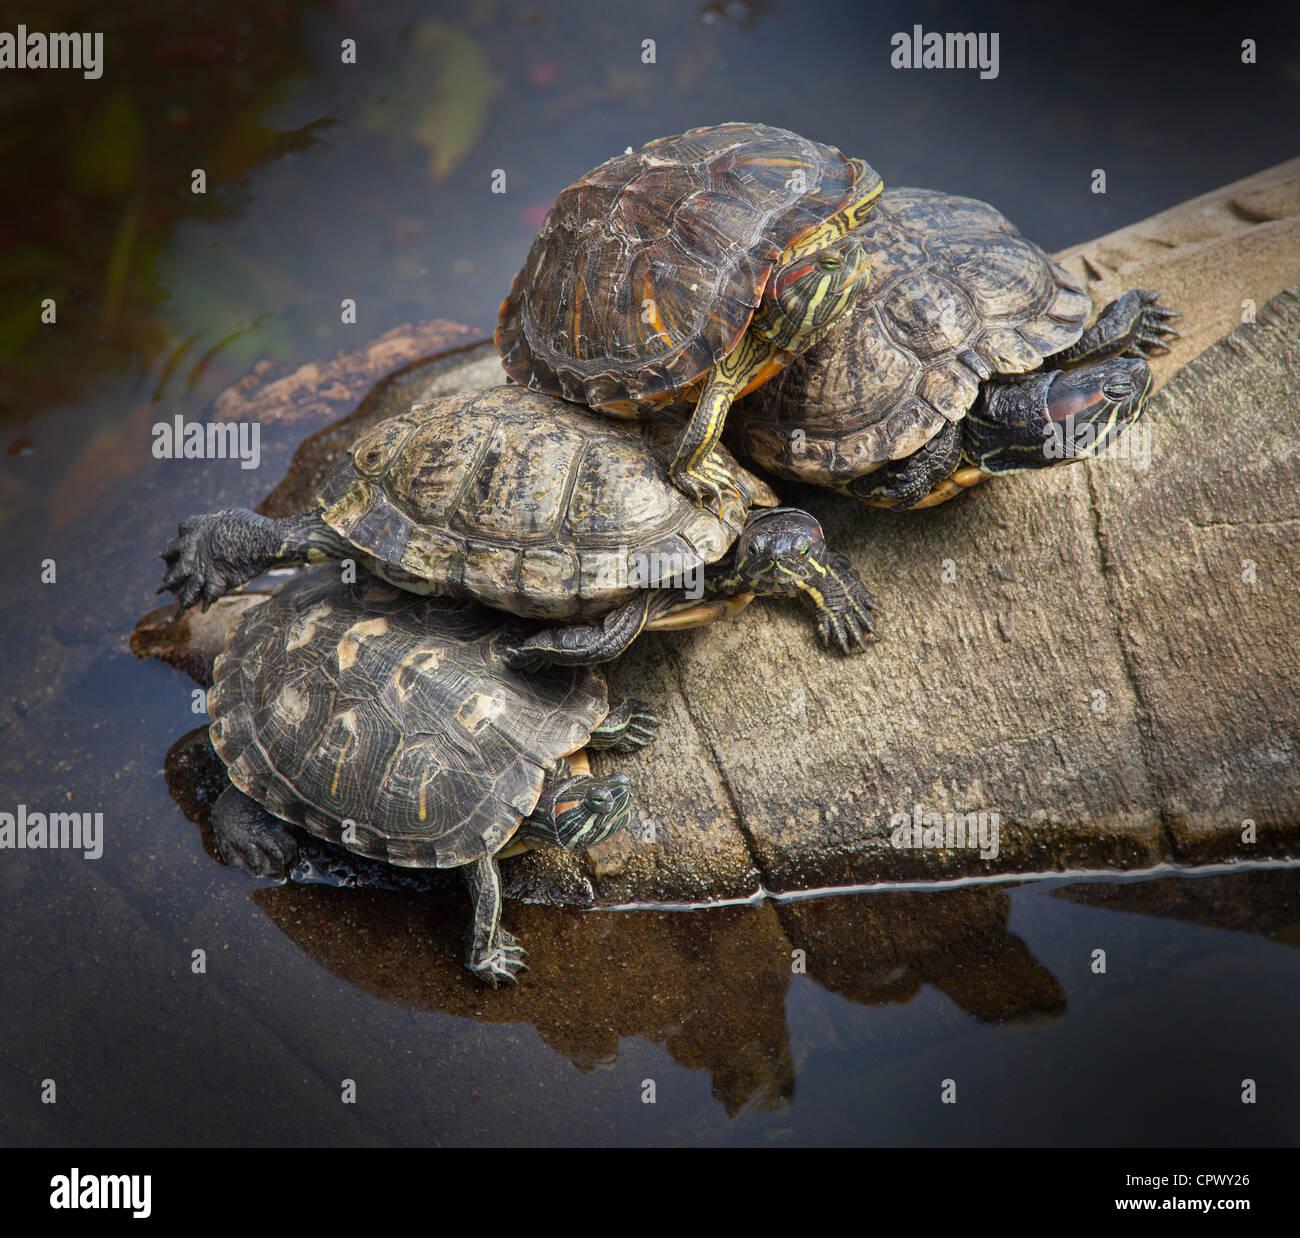 A group of basking red-eared slider turtles, Trachemys scripta elegans - Stock Image